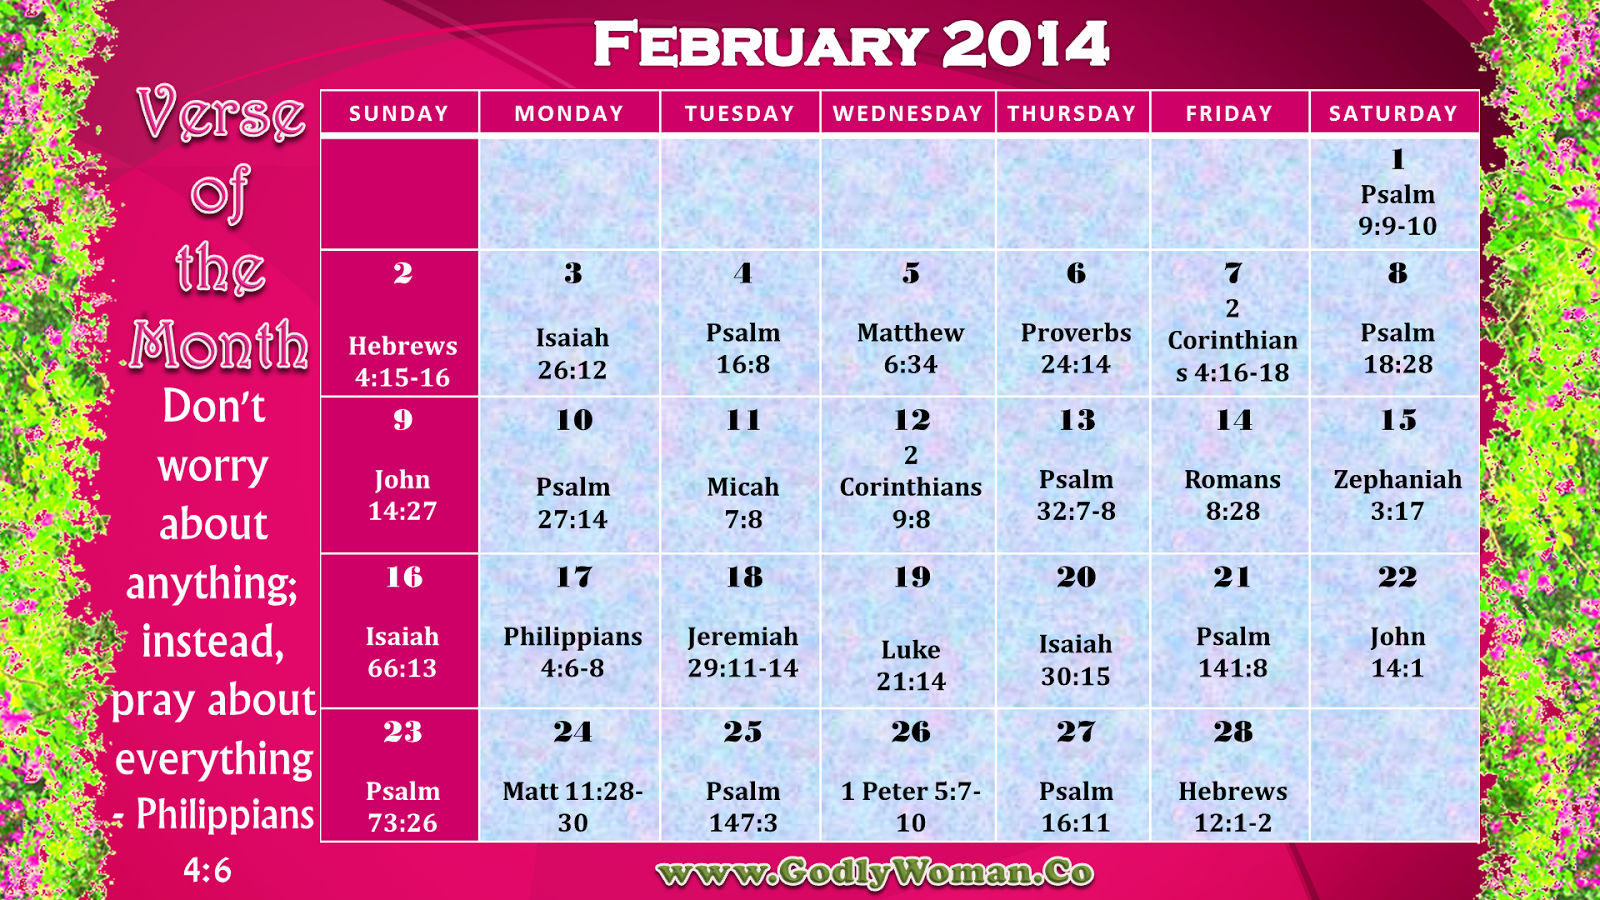 February 2014 Verse Of The Day Calender - Verseverse Daily Scripure Prayer Calendar